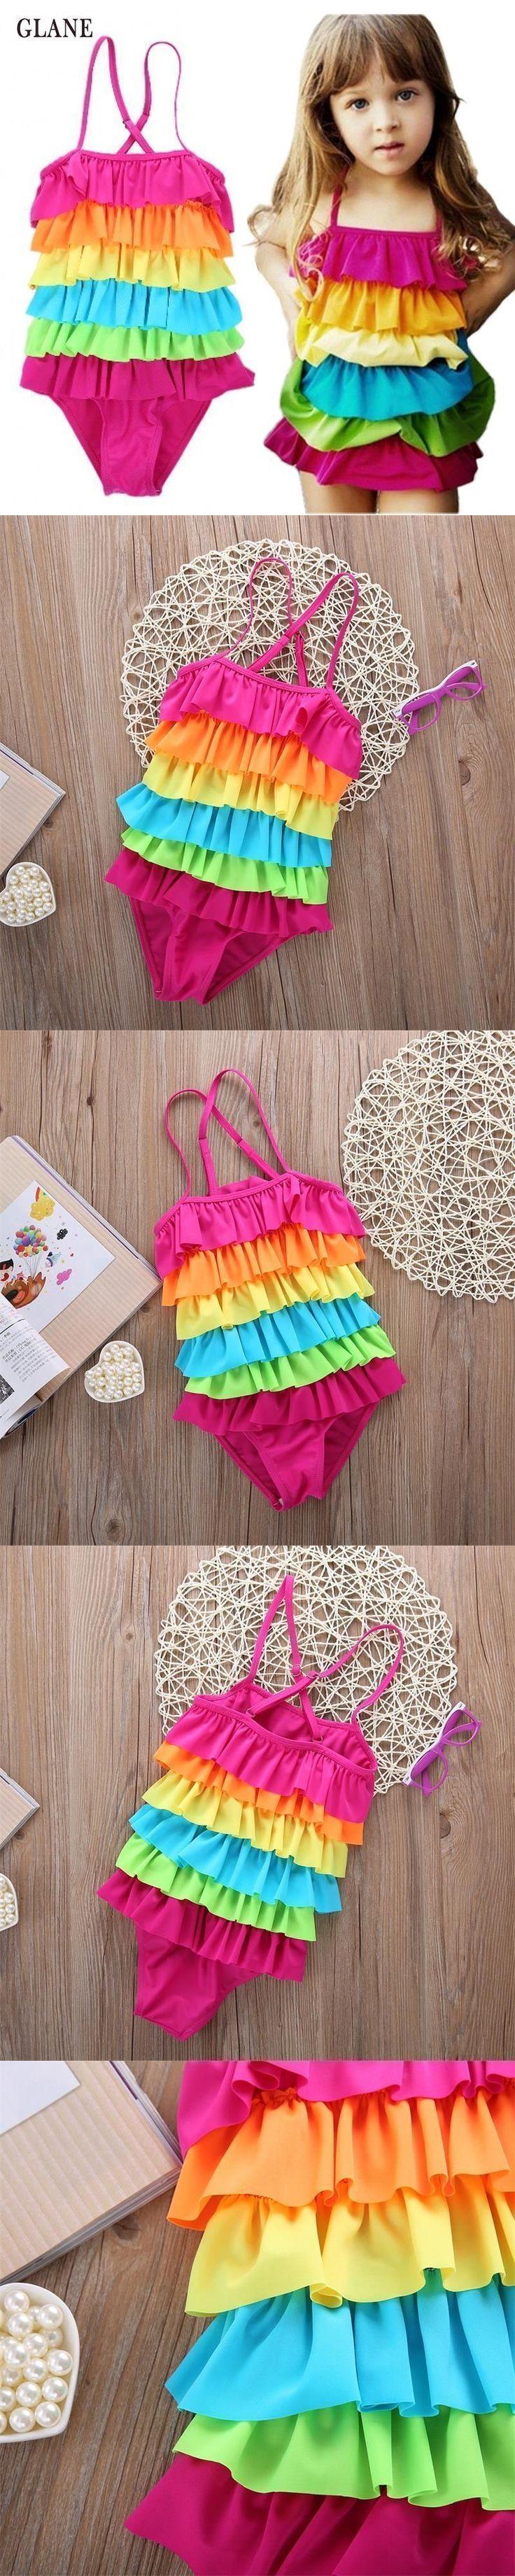 713 best toddler swim suits images on Pinterest